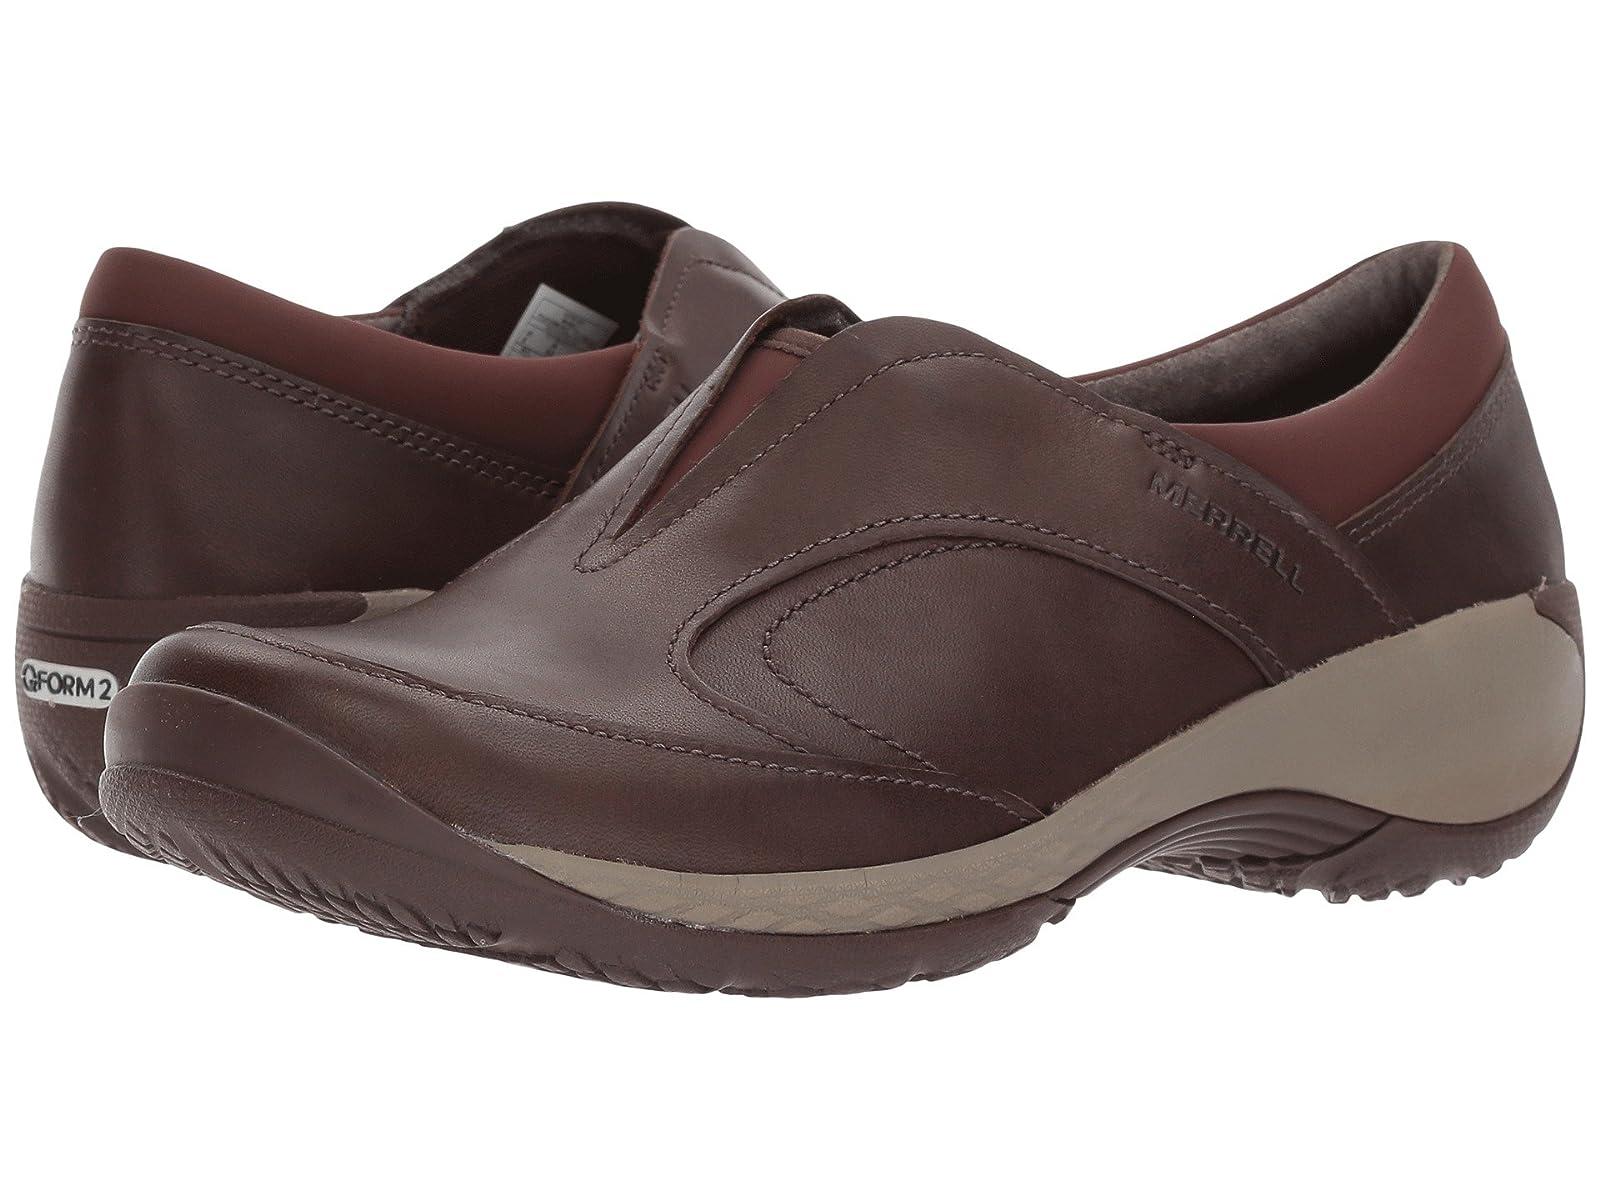 Merrell Encore Q2 Moc LeatherAtmospheric grades have affordable shoes